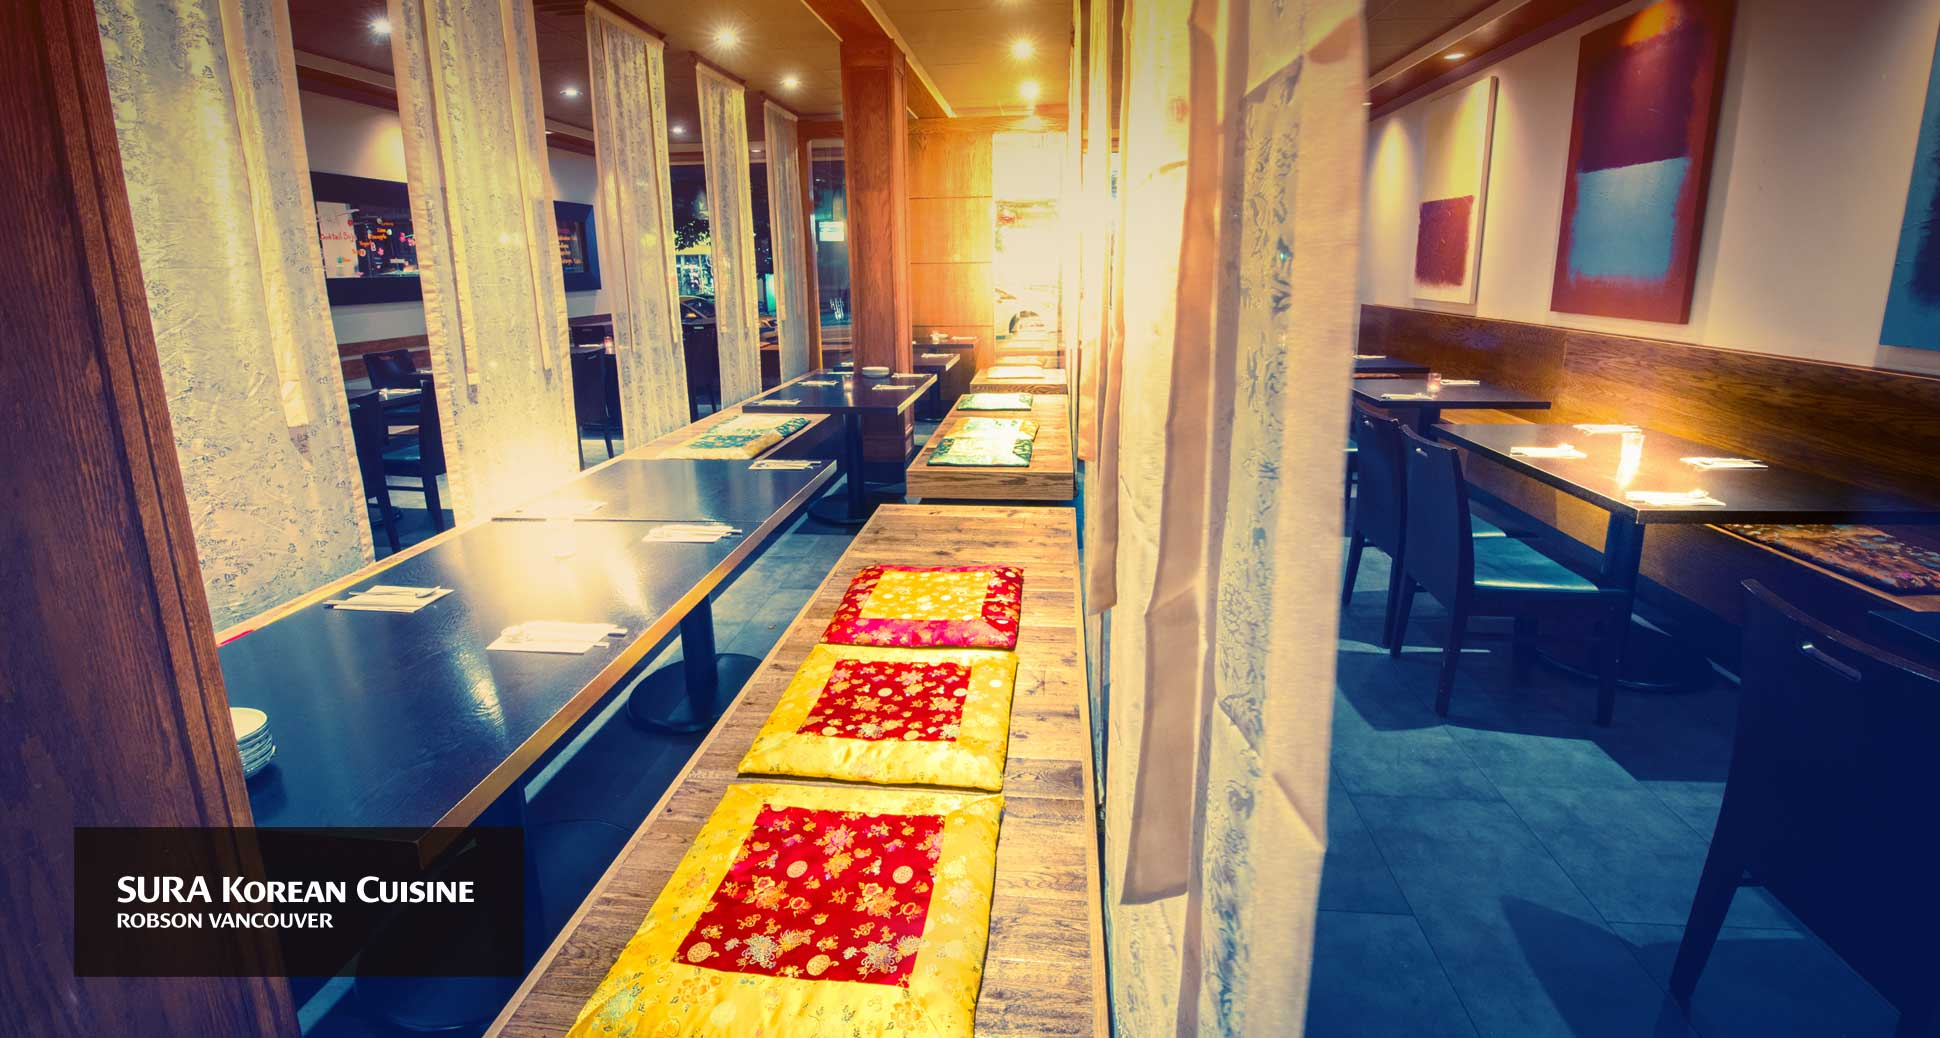 Plan your perfect holiday season with Sura Korean Cuisine restaurant!